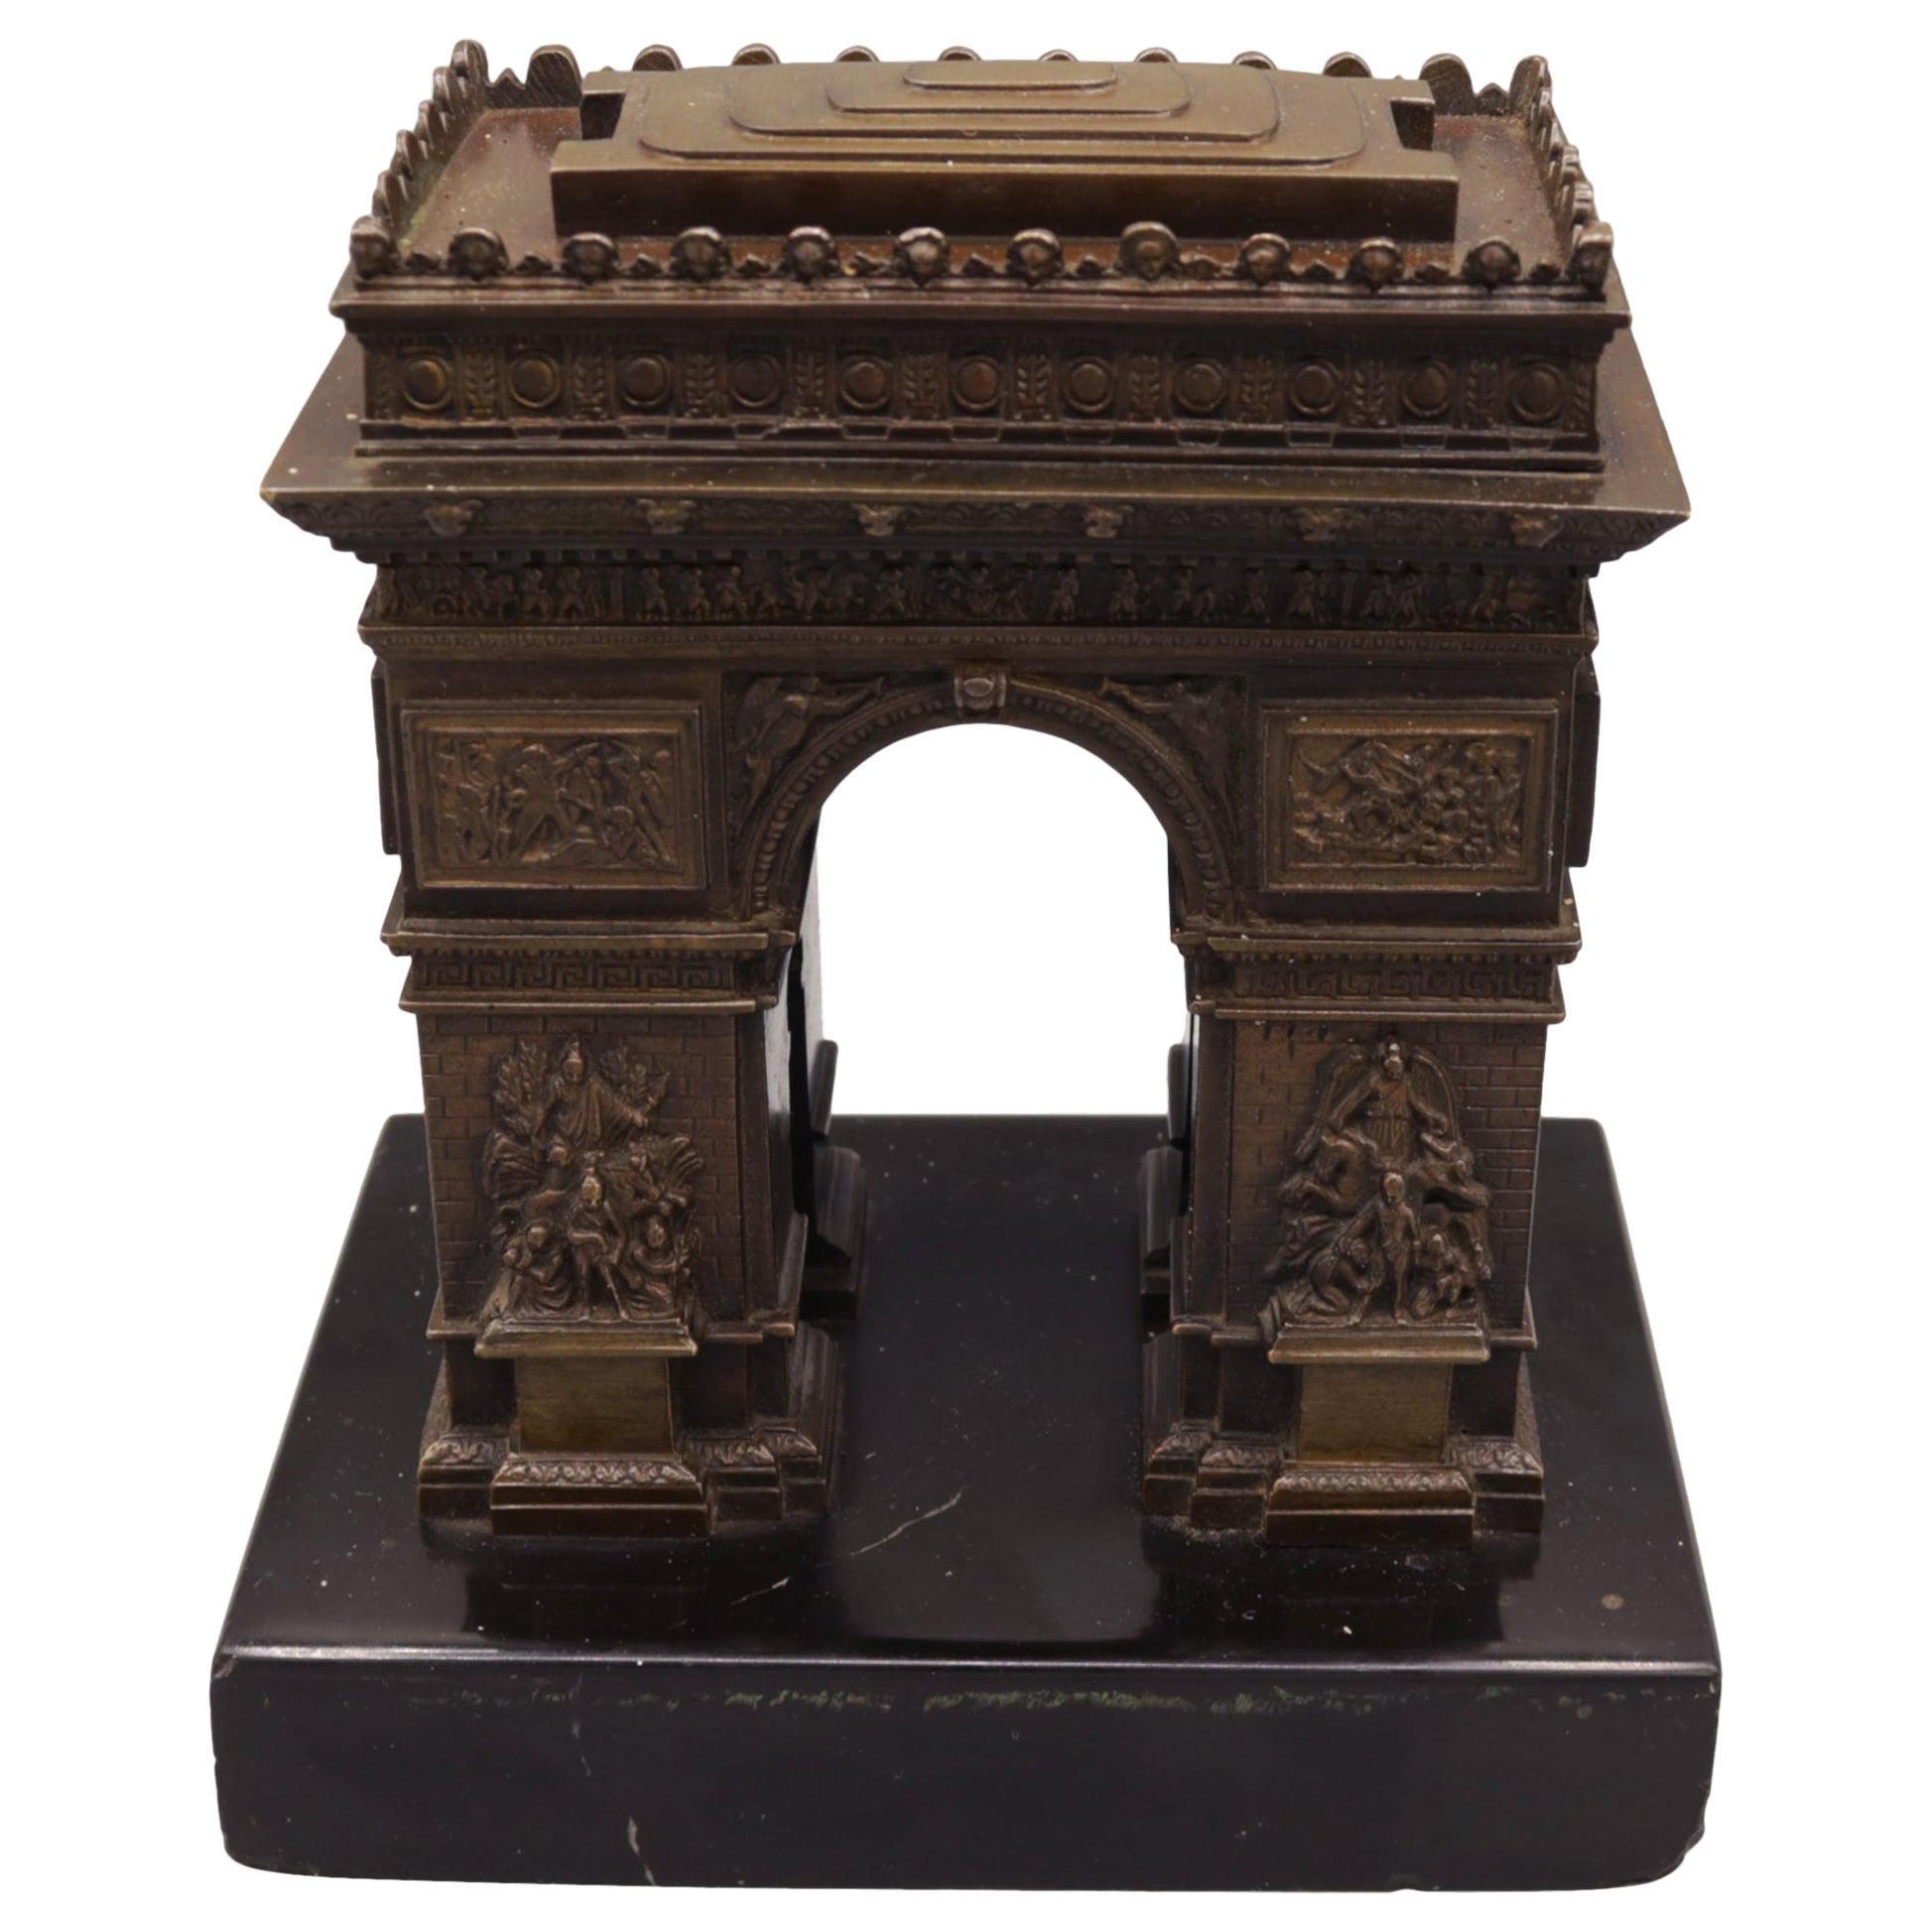 Unusual Mid-19th Century Bronze Model of the Arc de Triomphe